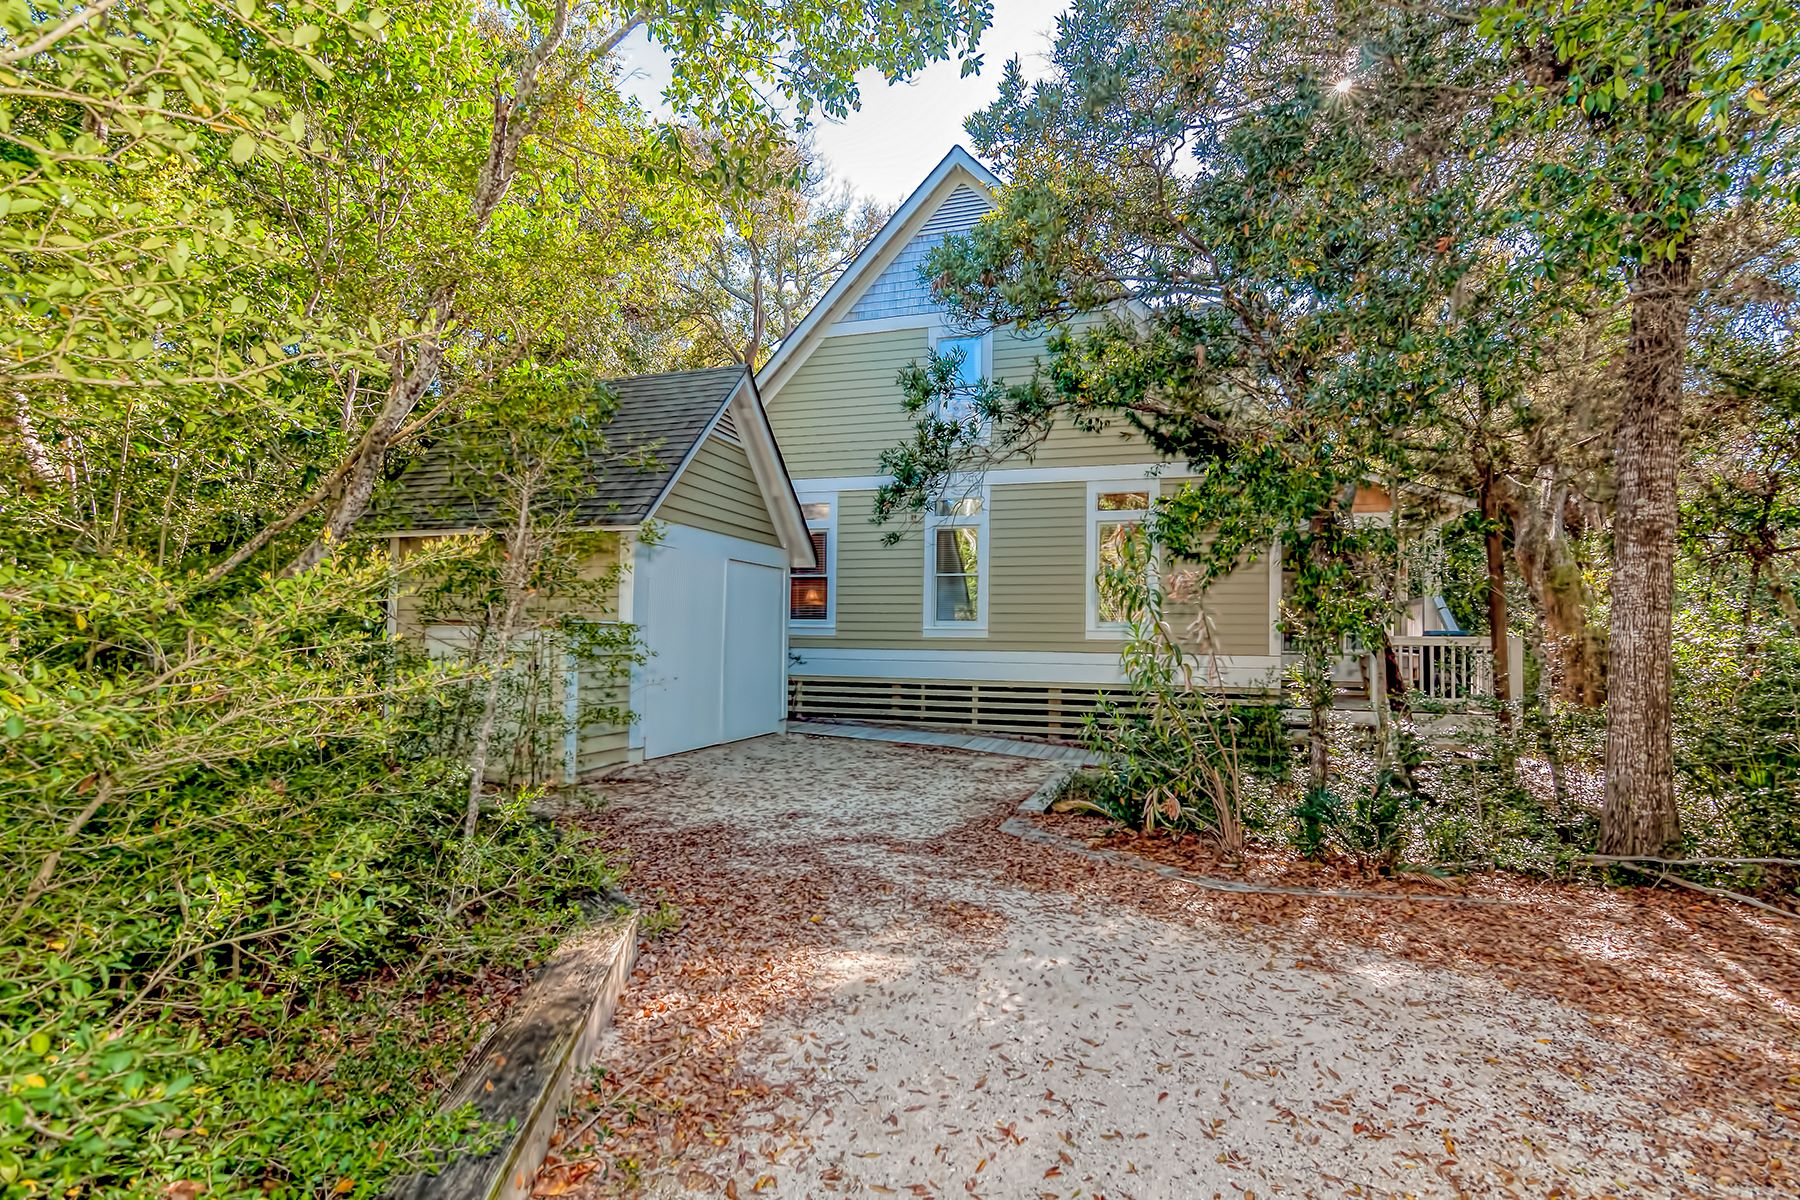 Casa Unifamiliar por un Venta en Beach Cottage among the Island's Magical Live Oaks 11 Sandwich Tern Trail, Bald Head Island, Carolina Del Norte, 28461 Estados Unidos